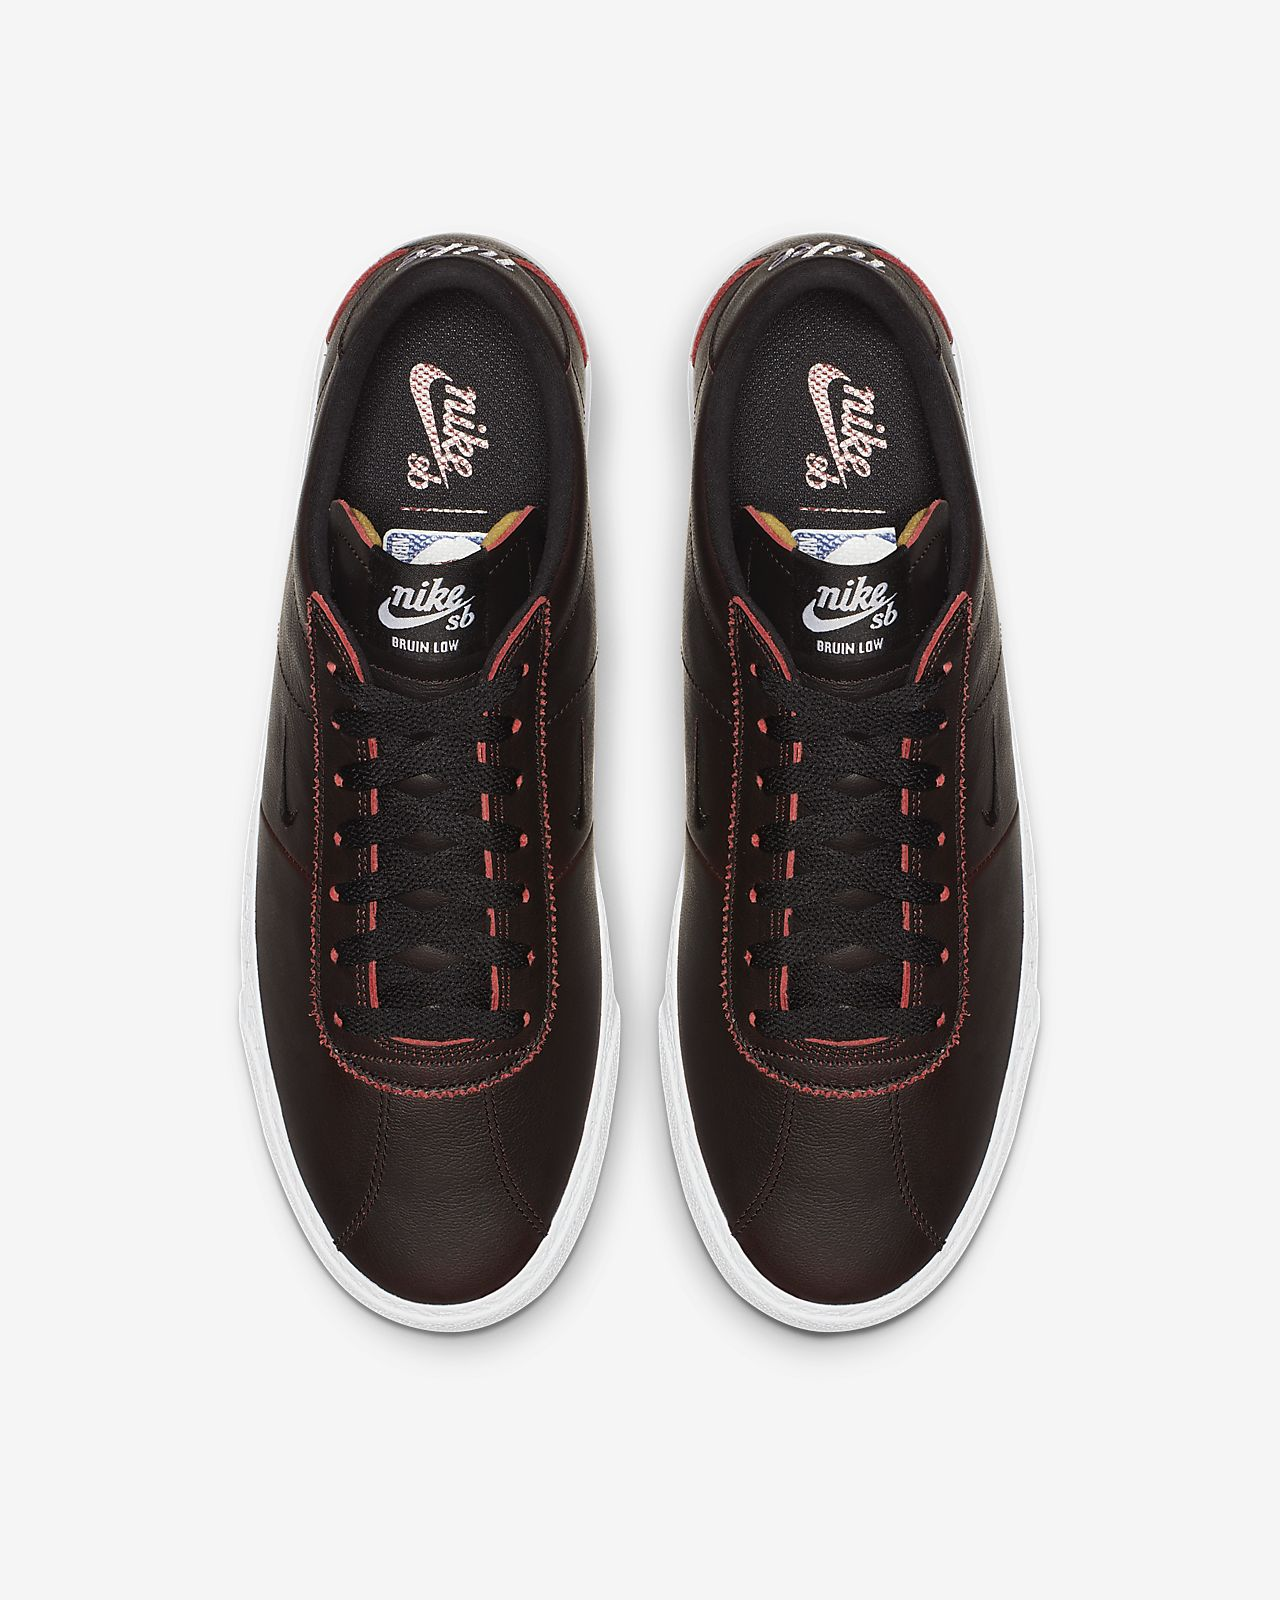 99deae5802365 Nike SB Zoom Bruin NBA Skate Shoe. Nike.com DK